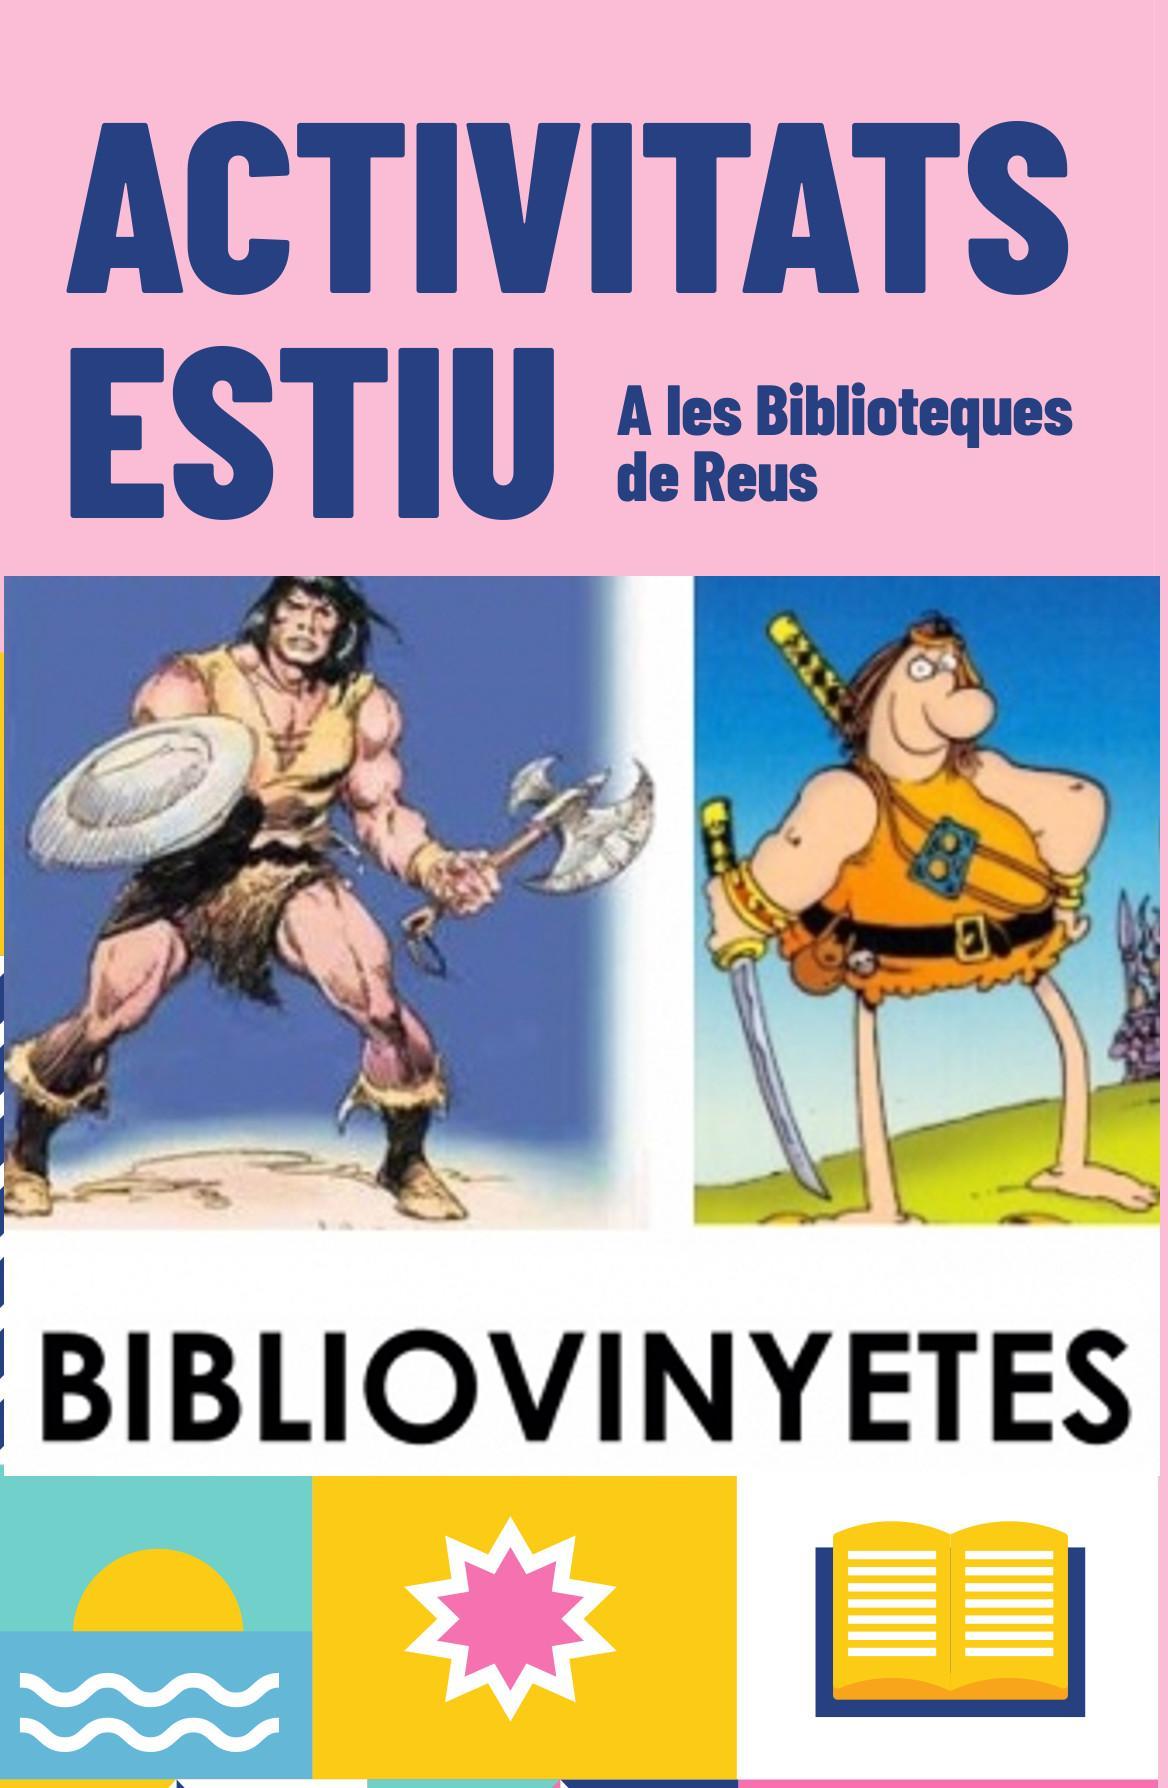 Taller de Bibliovinyetes